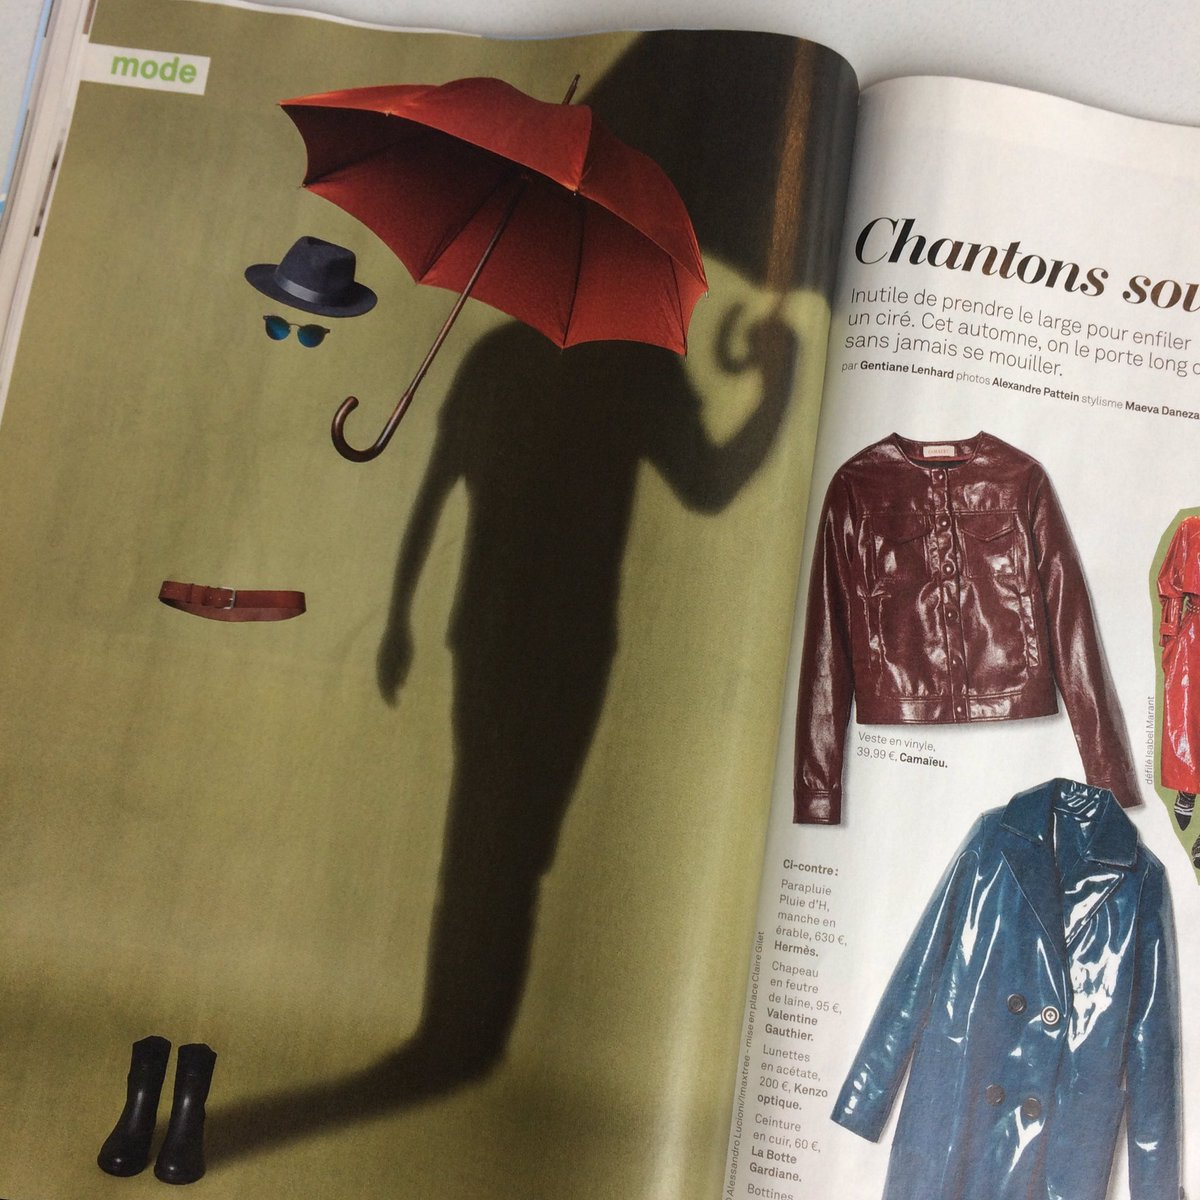 Magritte es-tu là ? #fun #leparisienmag #hermes sous la pluie.pic.twitter.com/Fu994pazyn